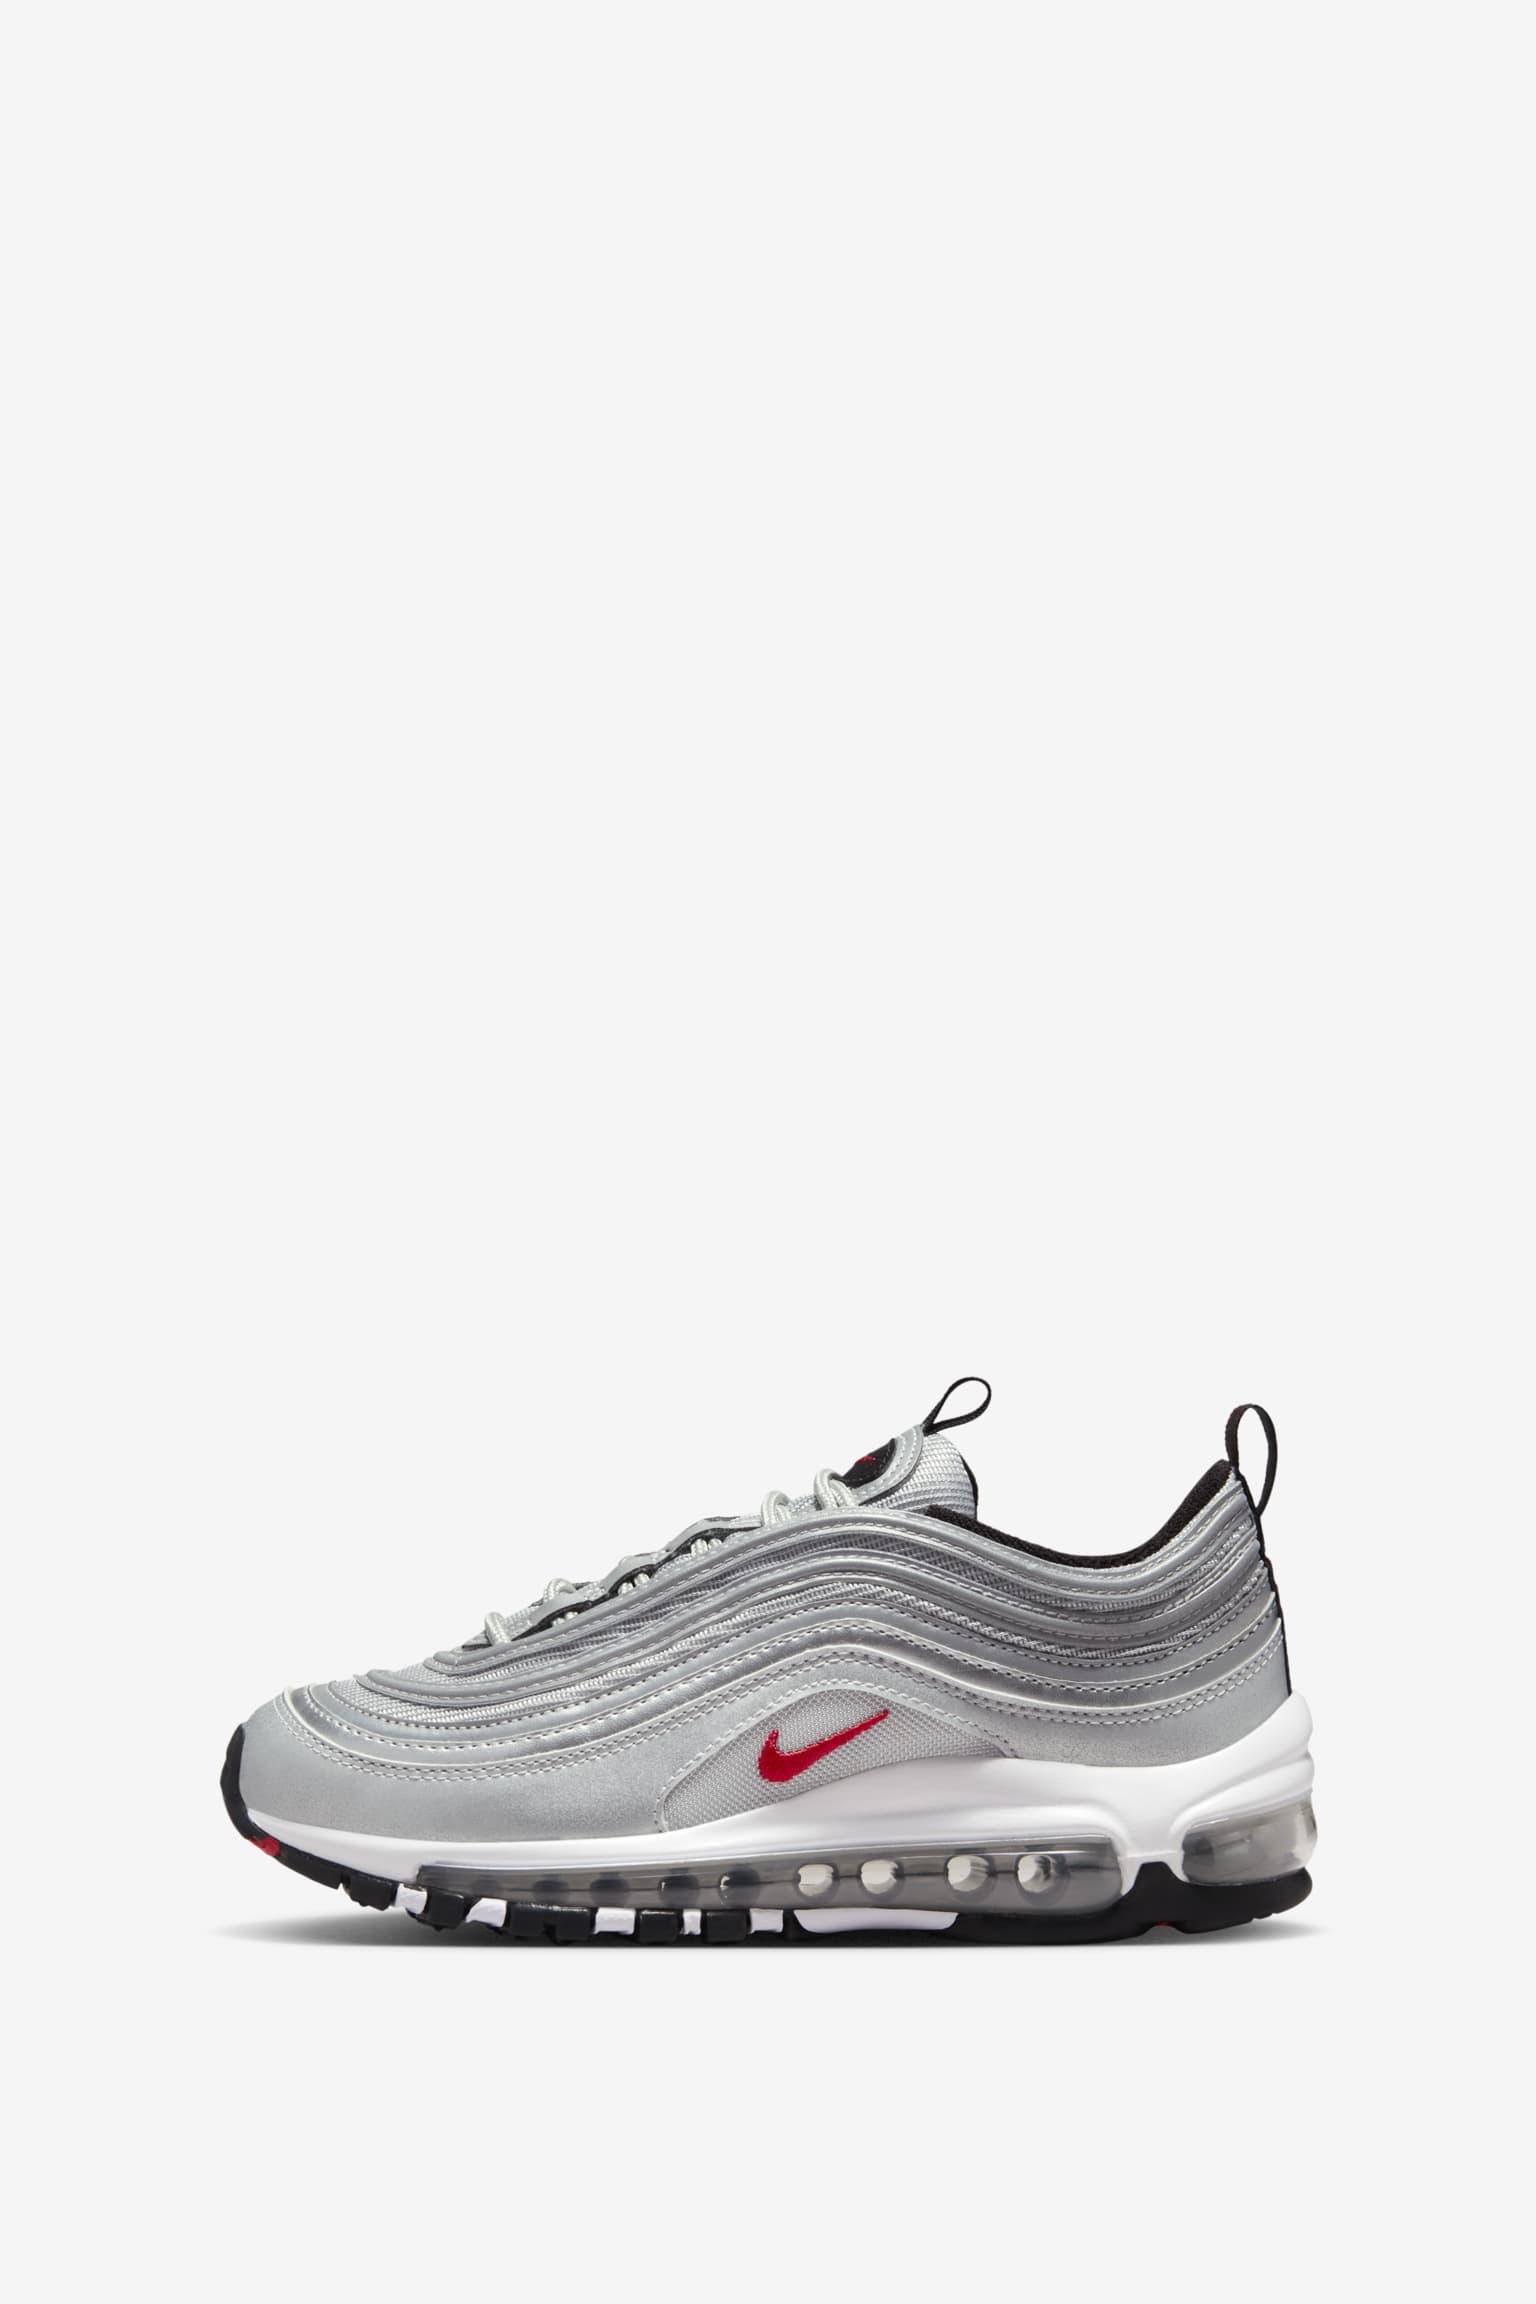 864b4004d3 Nike Air Max 97 OG 'Metallic Silver'. Nike+ SNKRS